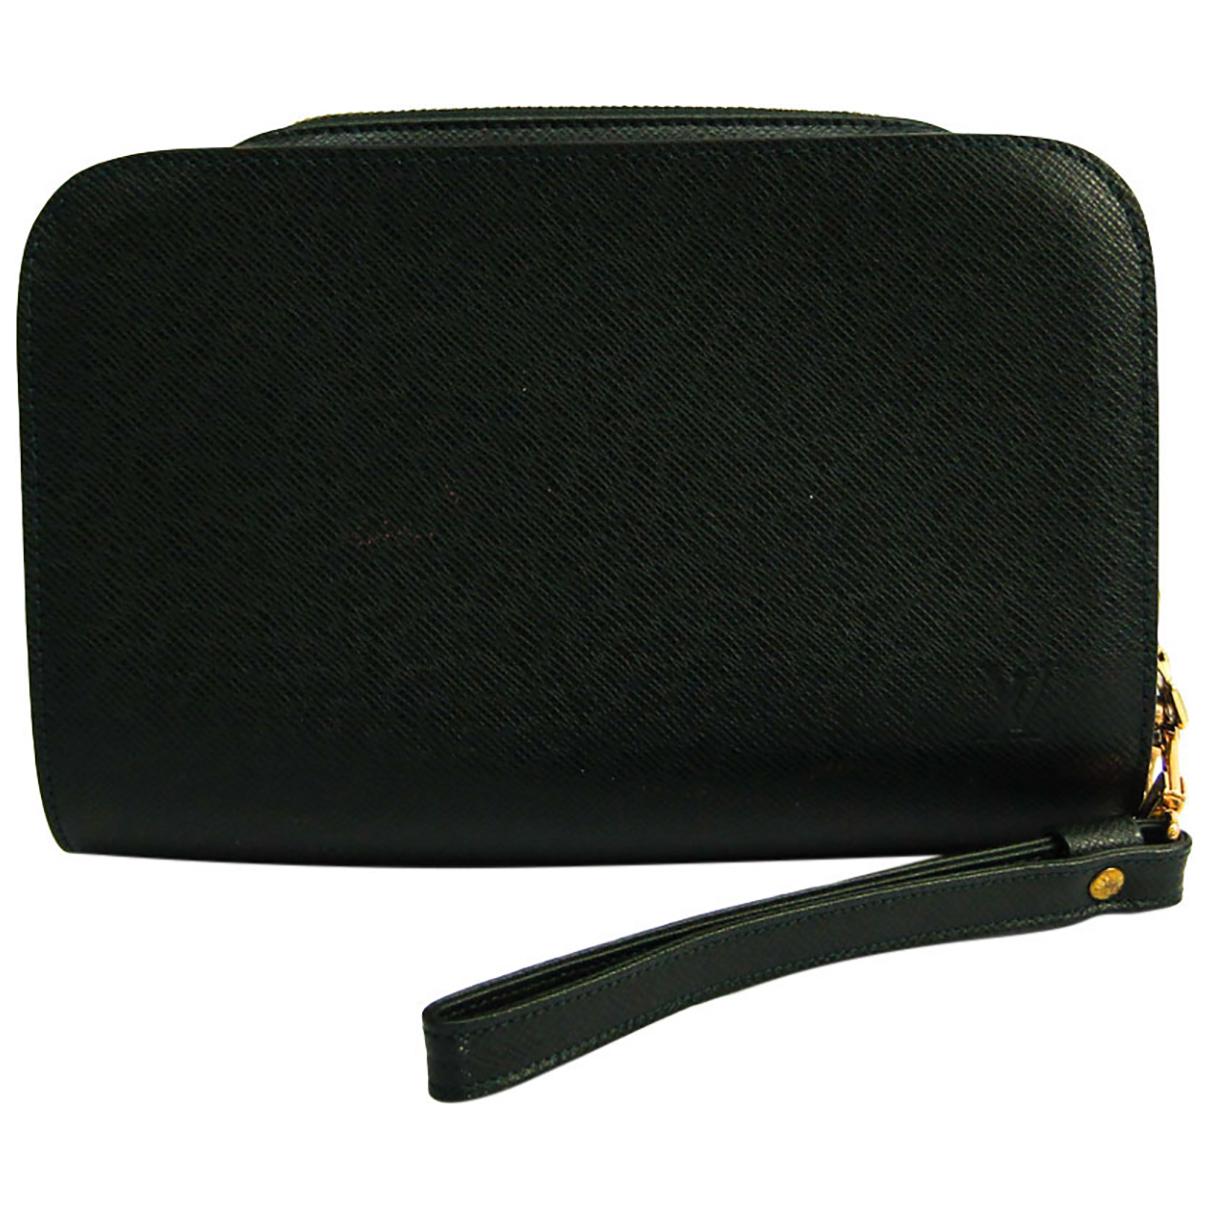 Louis Vuitton \N Clutch in  Gruen Leder